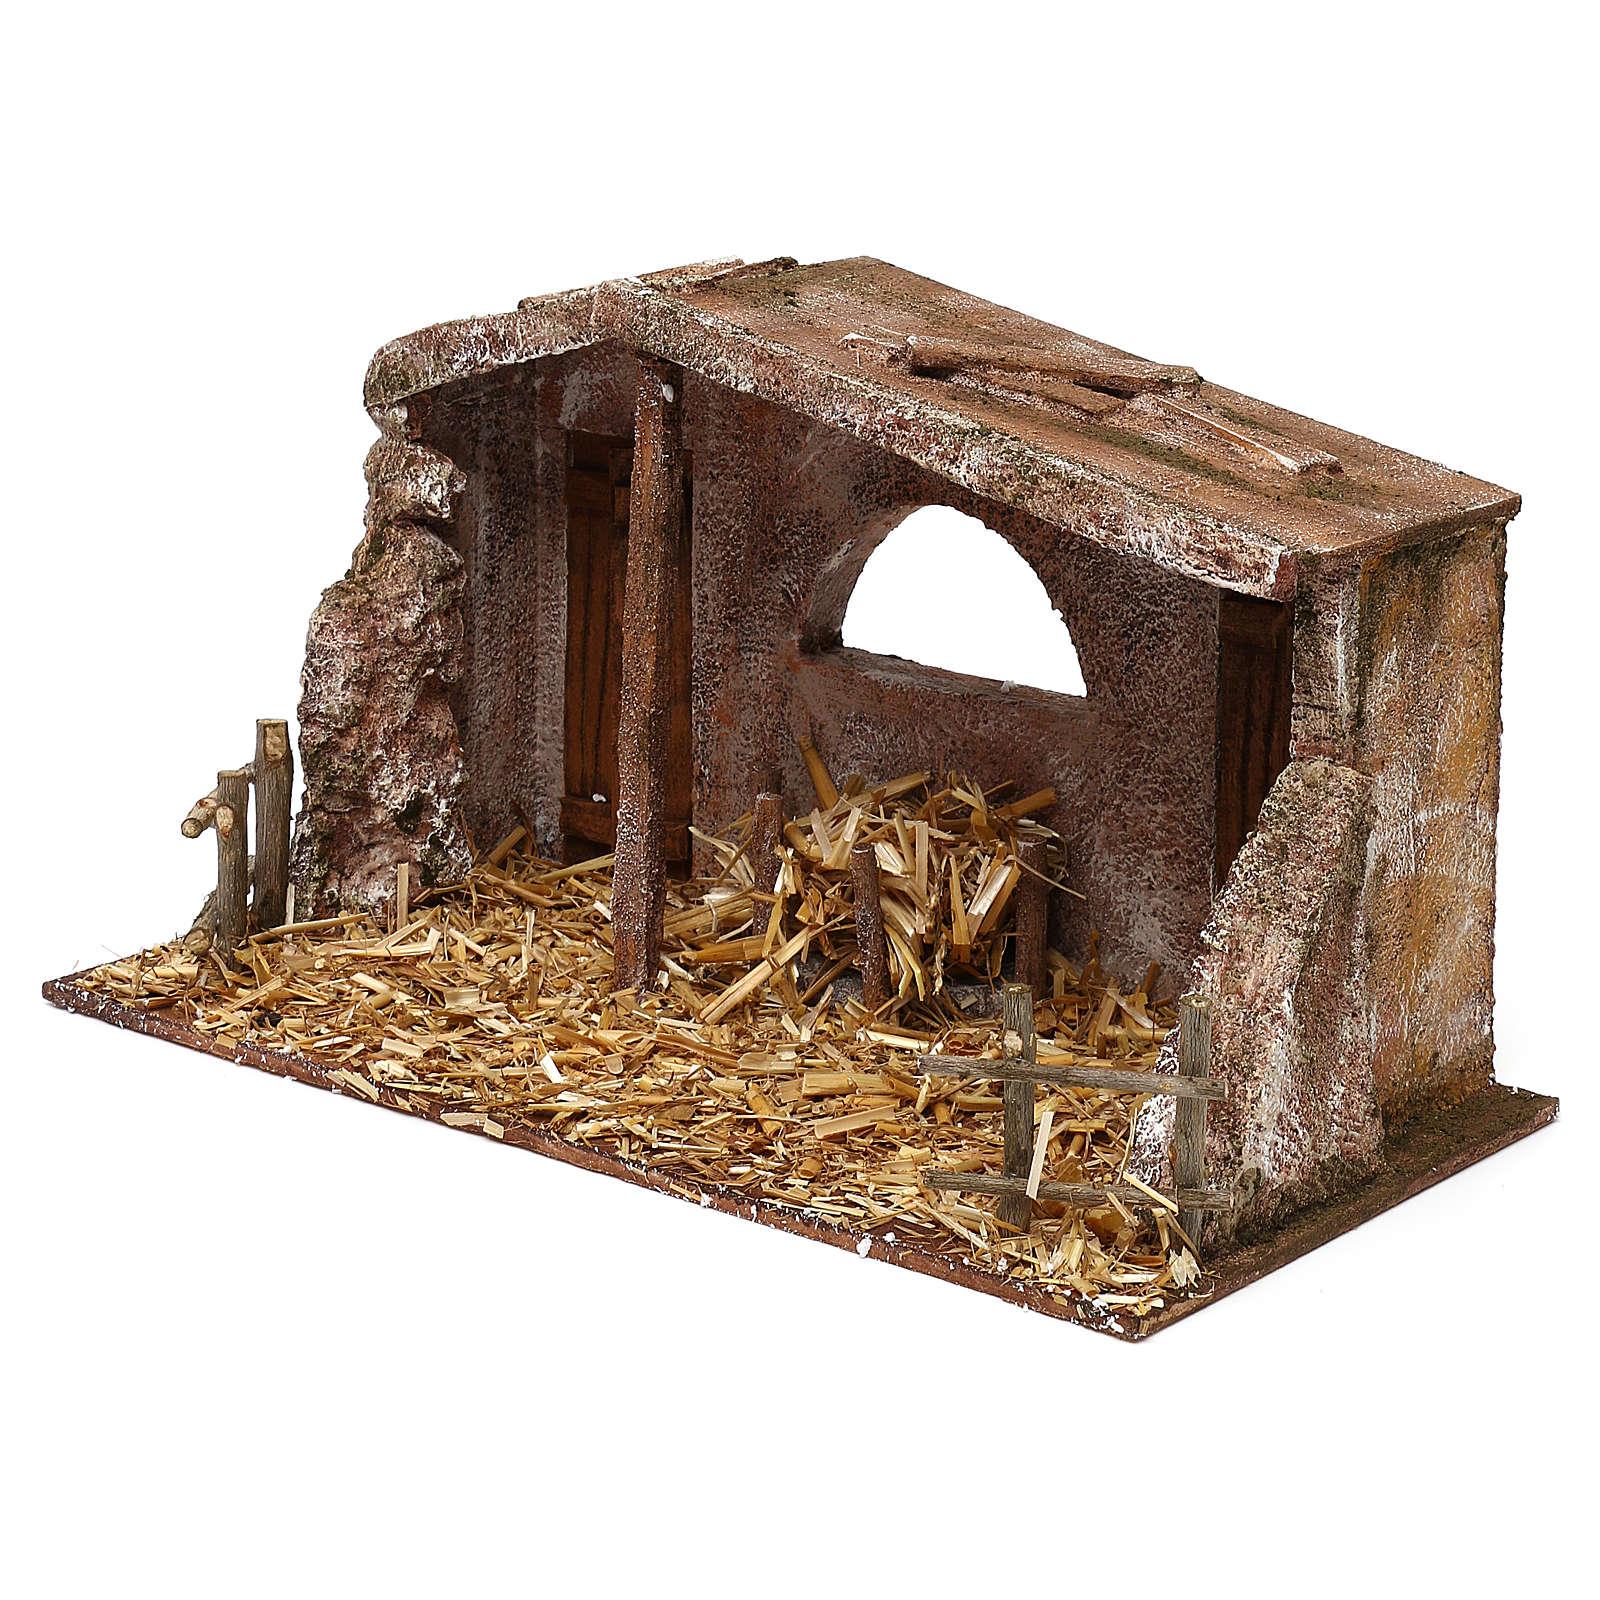 Cabaña con hogar cerca a los lados de 20x35x10 cm para belén 12 cm 4